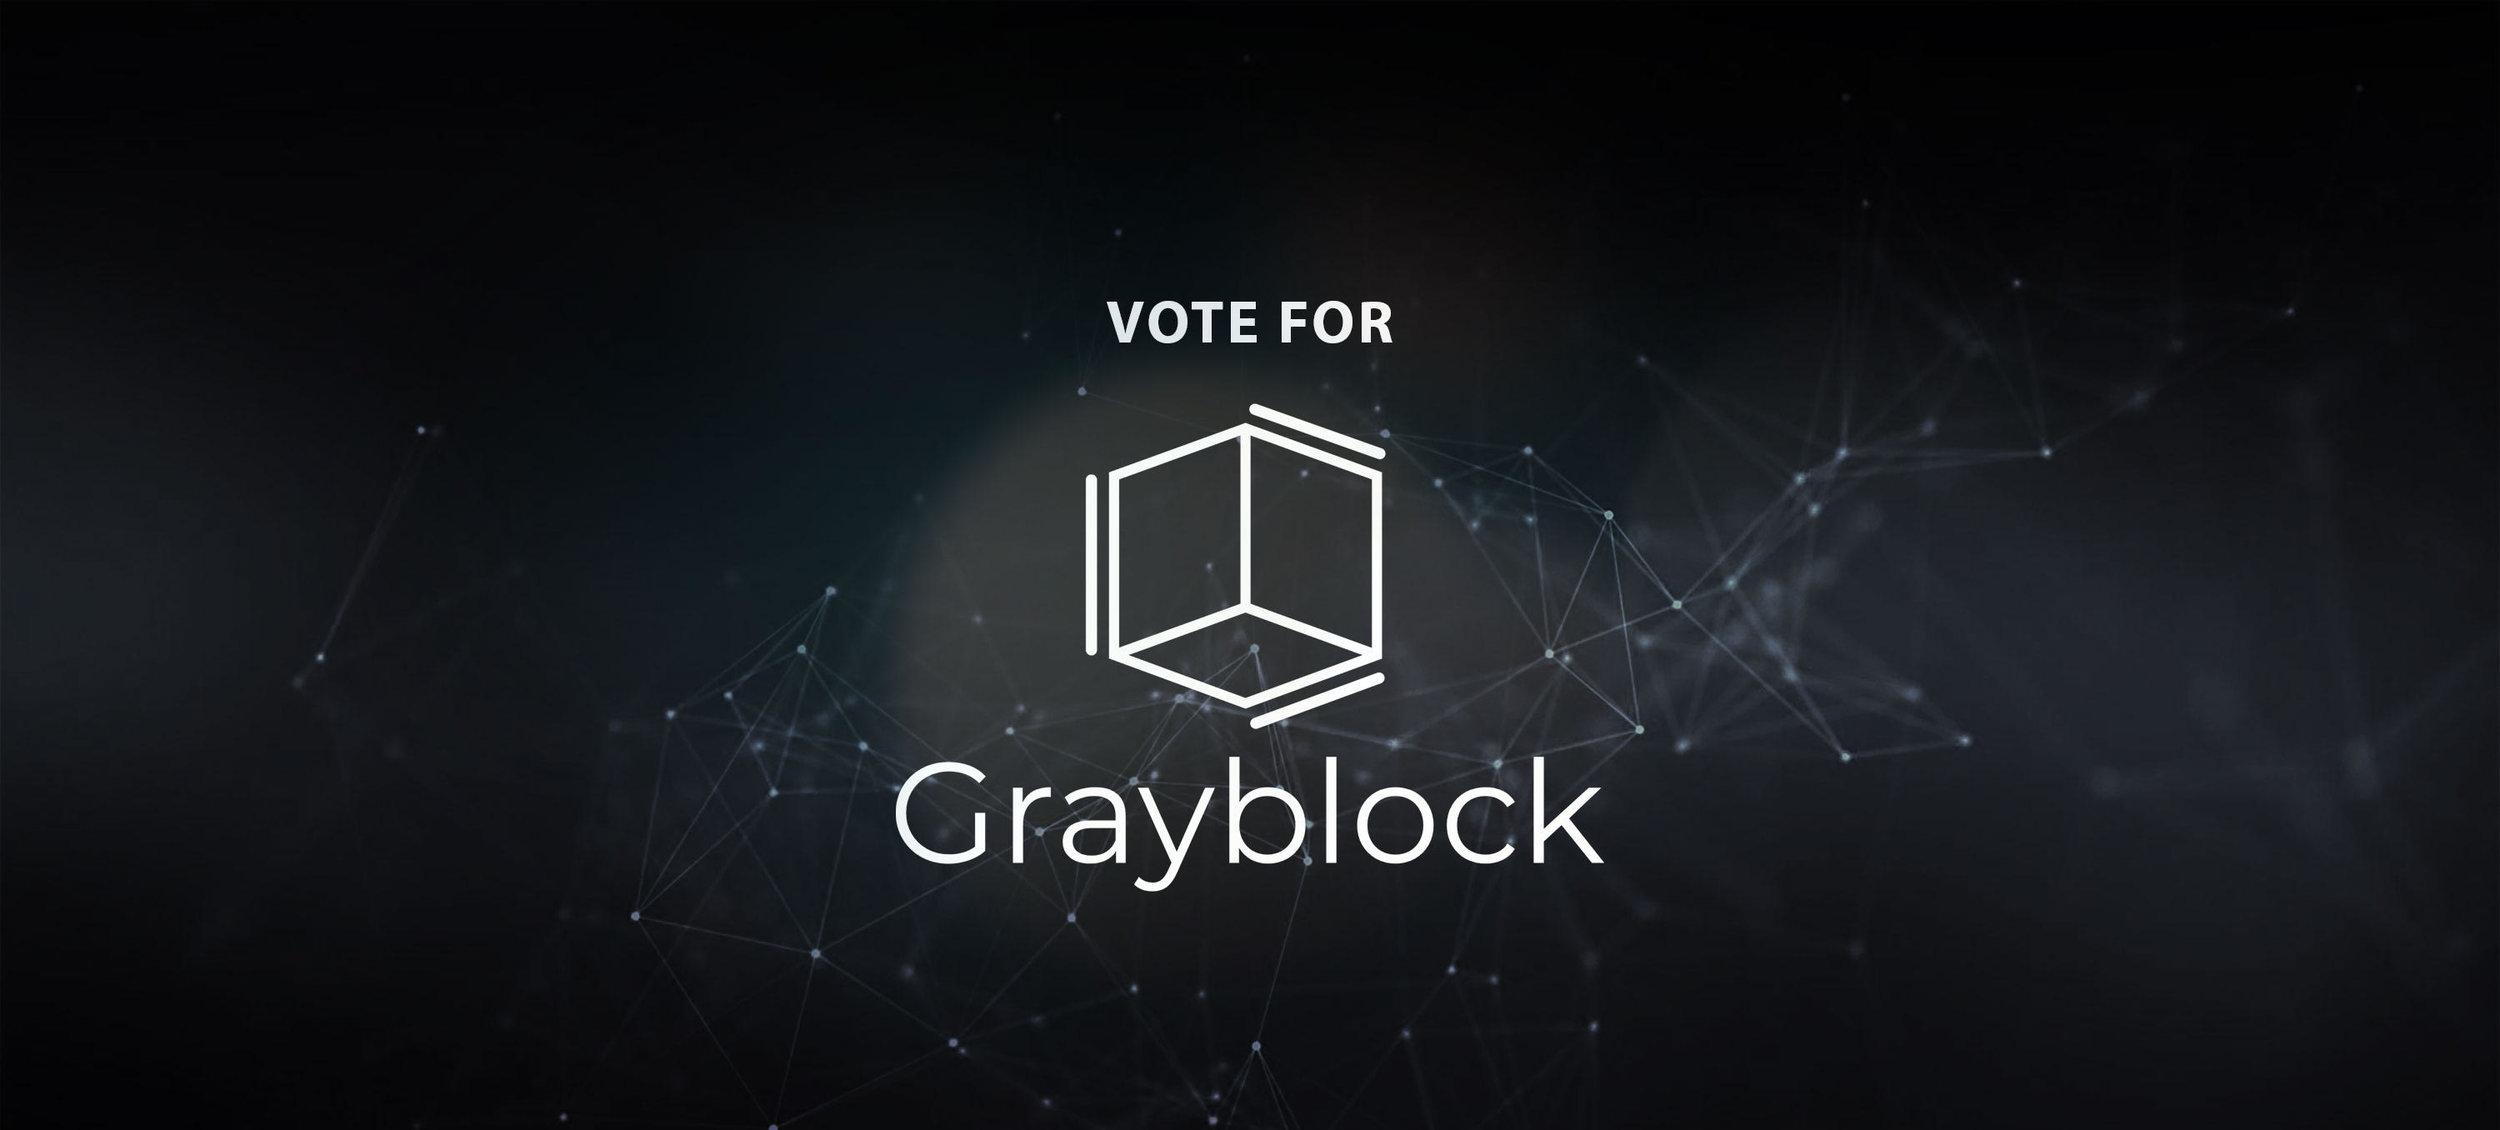 VoteForGrayblock2.jpg